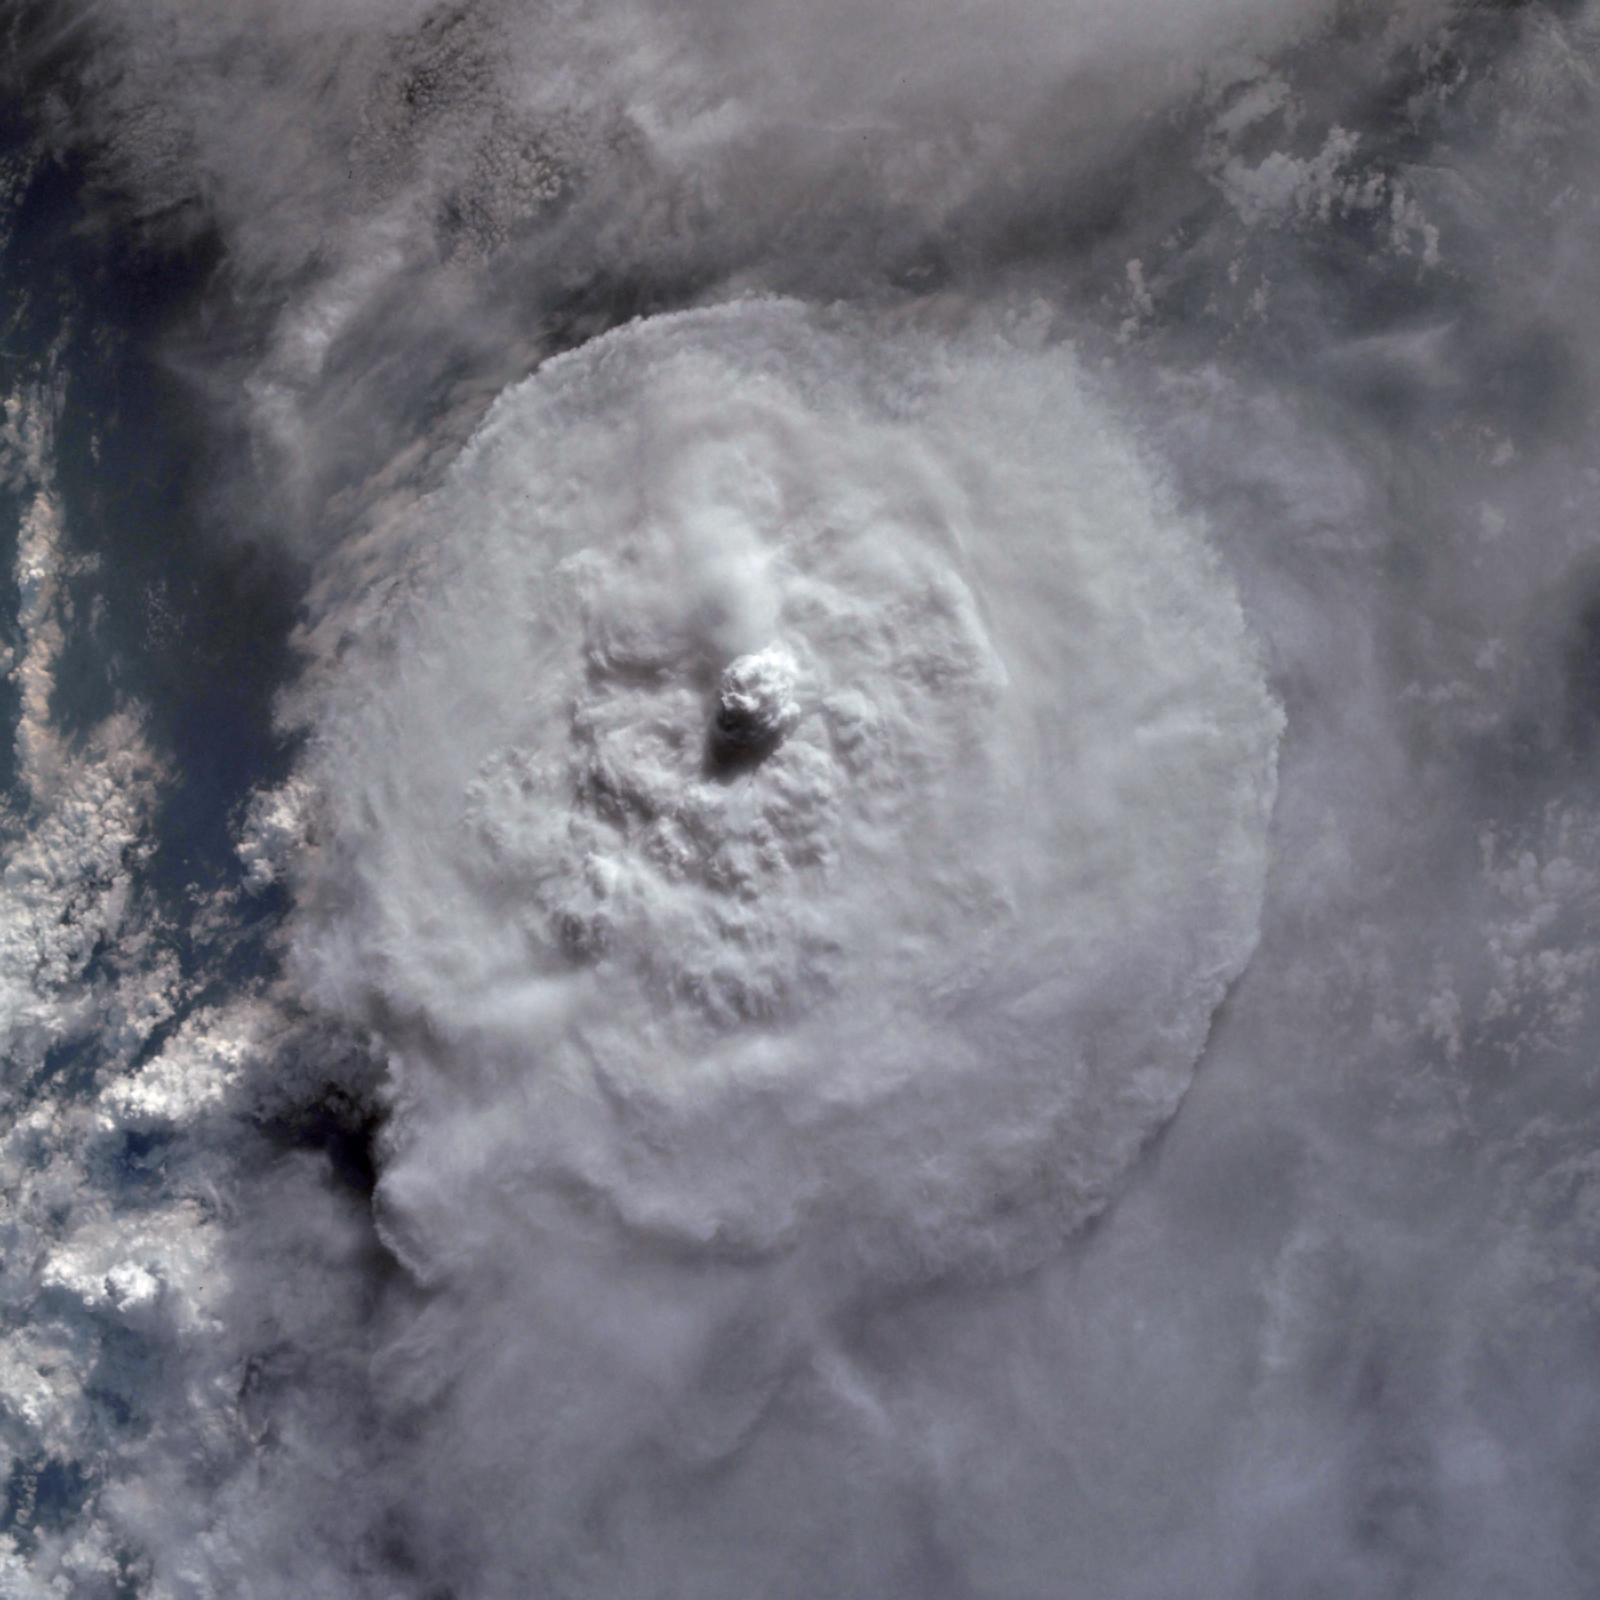 Circular convective storm with a large overshooting top. Credit: NASA